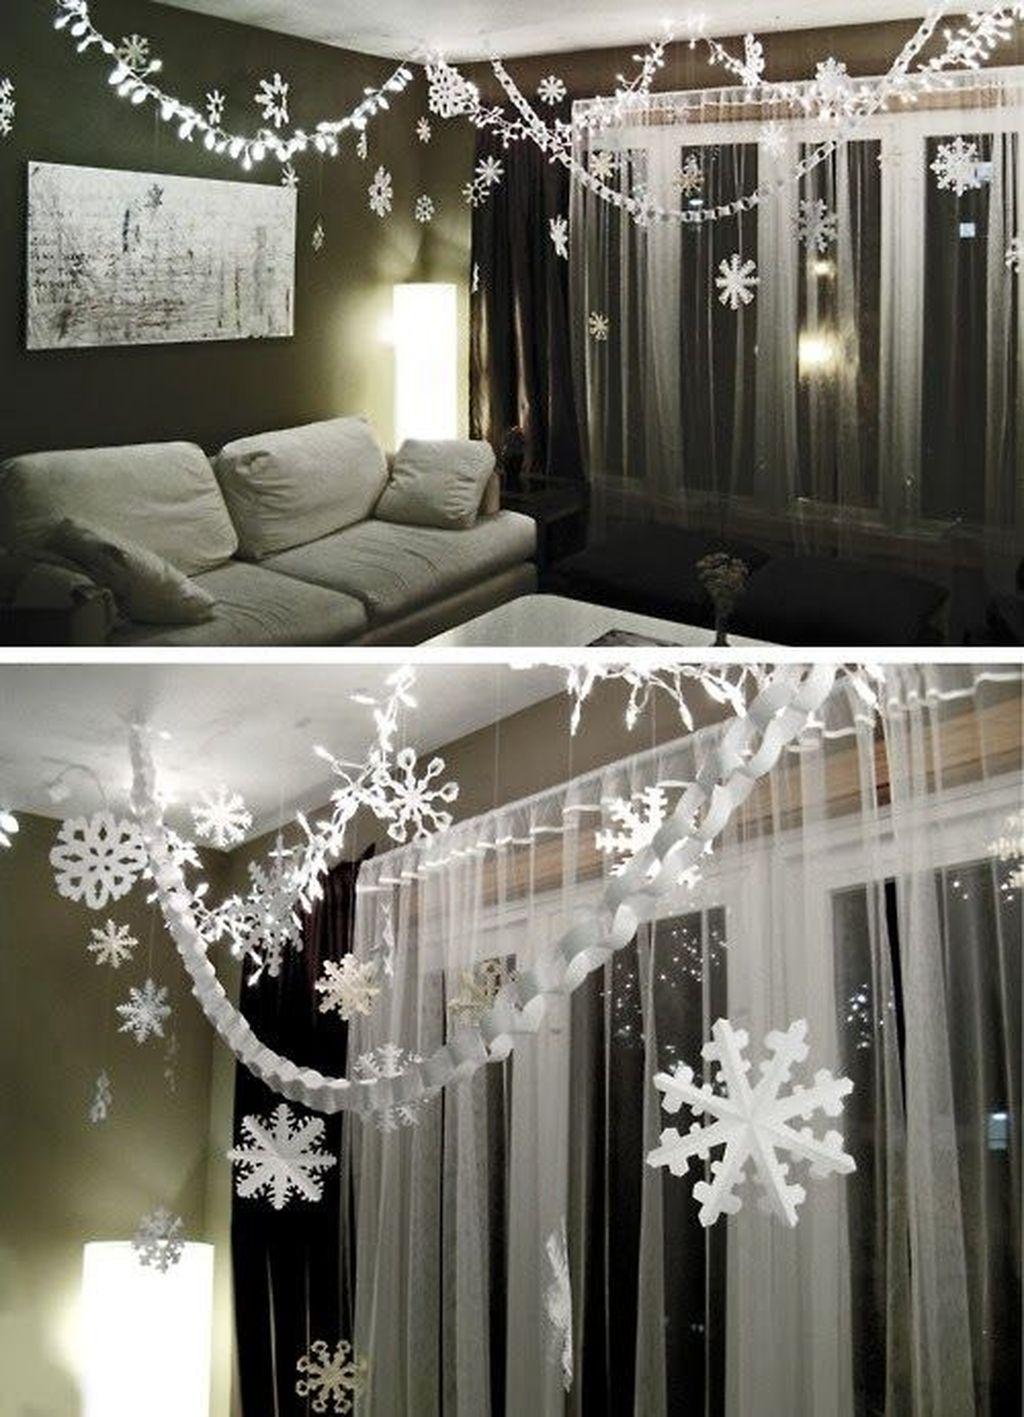 Creative Diy Room Decoration Ideas For Winter 29